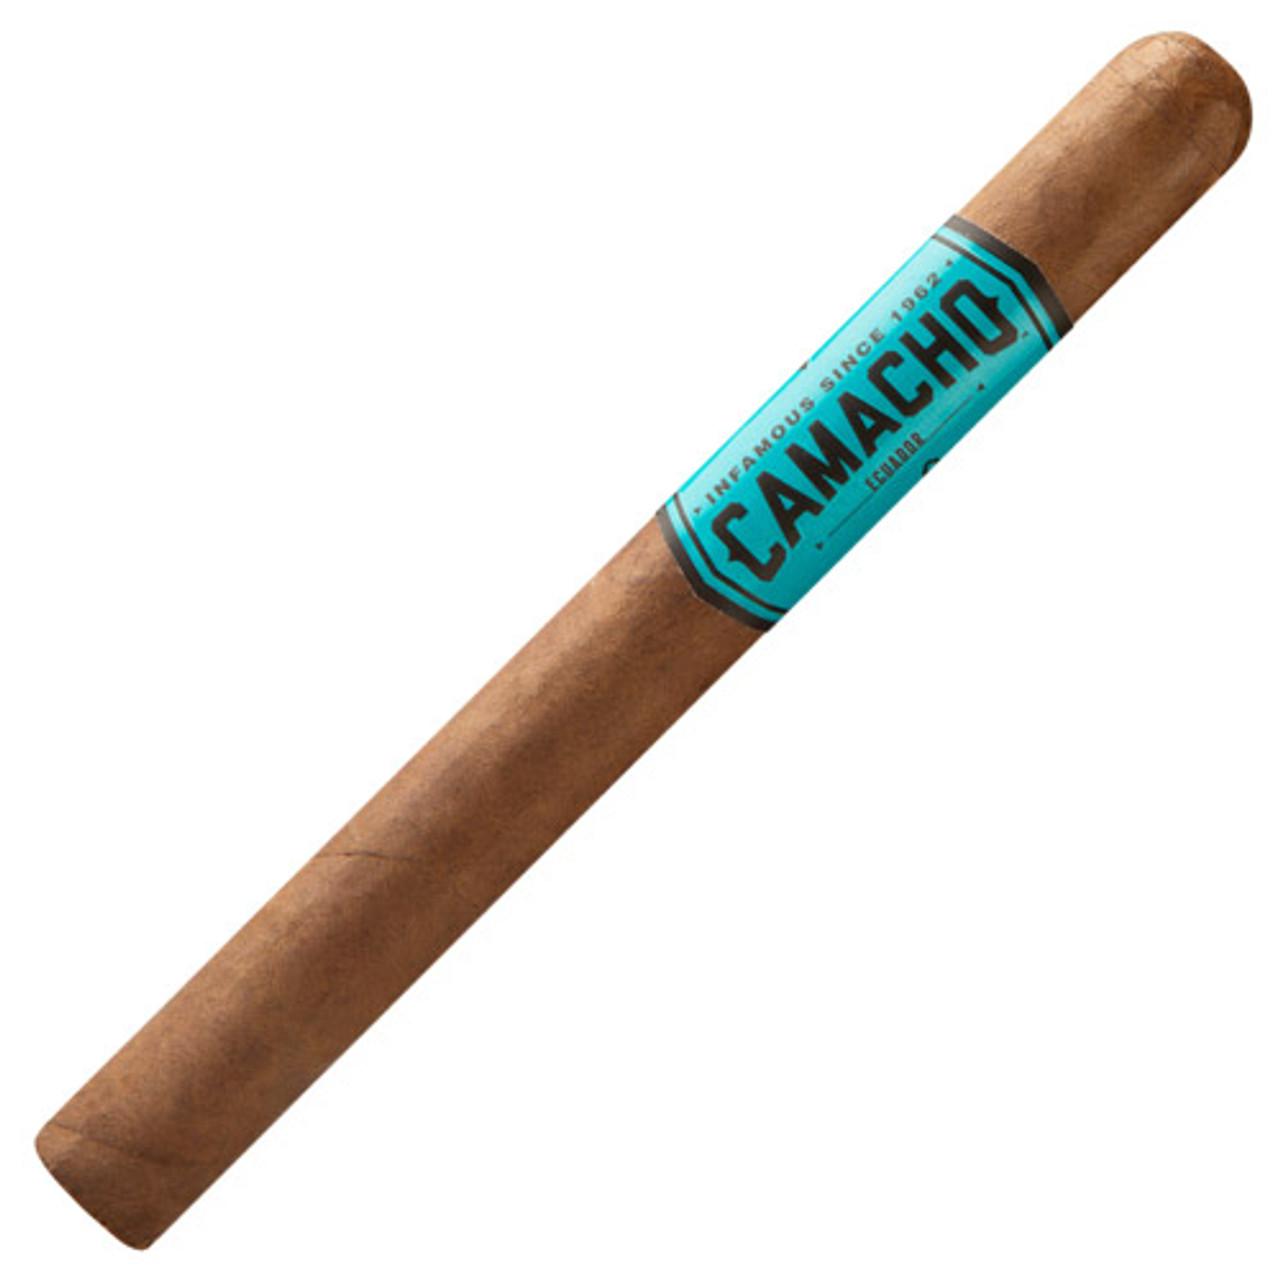 Camacho Ecuador Churchill Cigars - 7 x 48 (Box of 20)